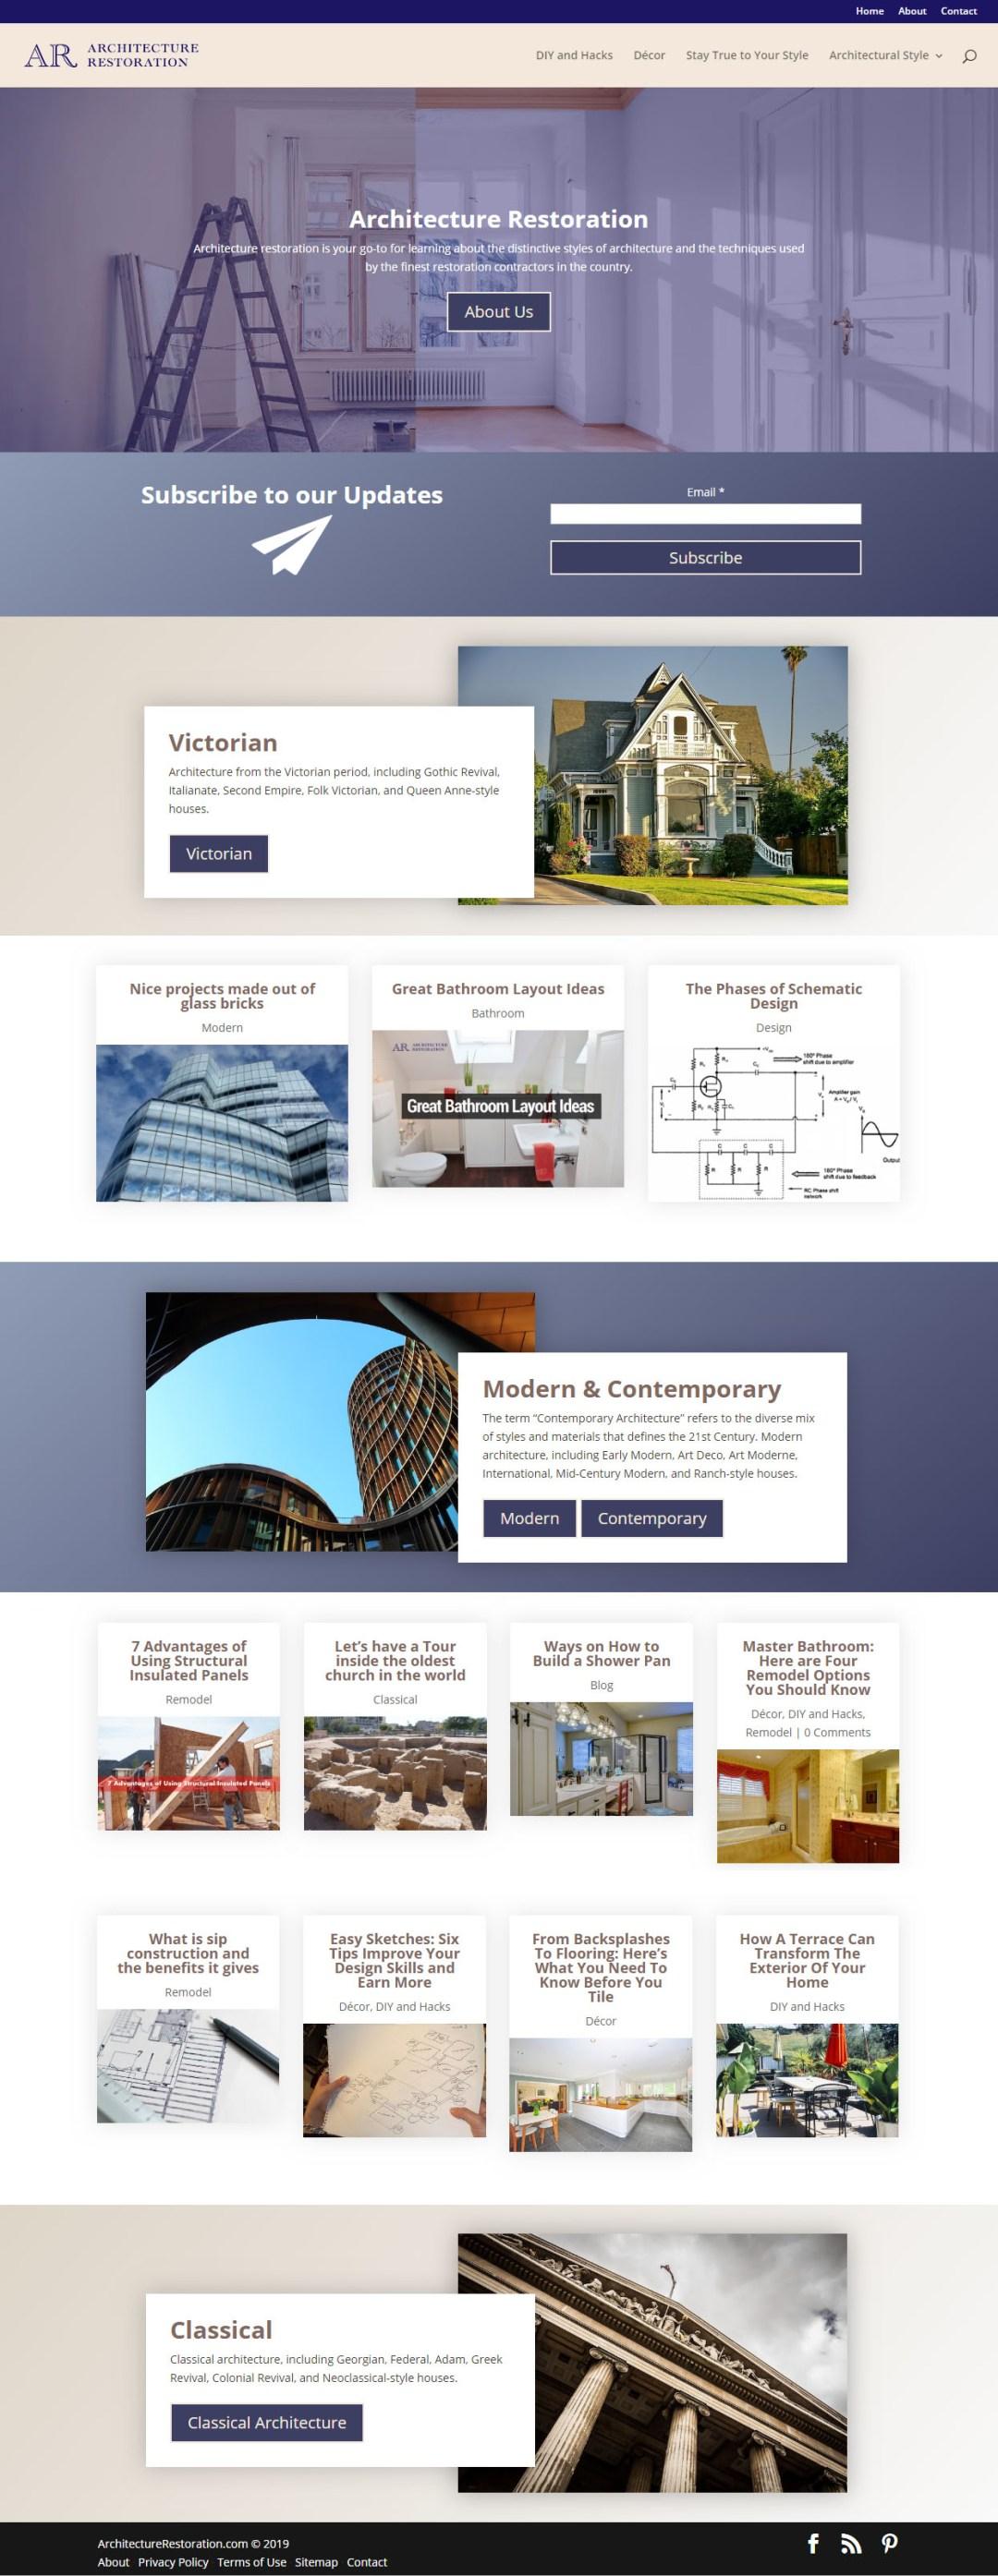 Architecture Restoration front page - screen shot - Elisabeth Parker's portfolio.